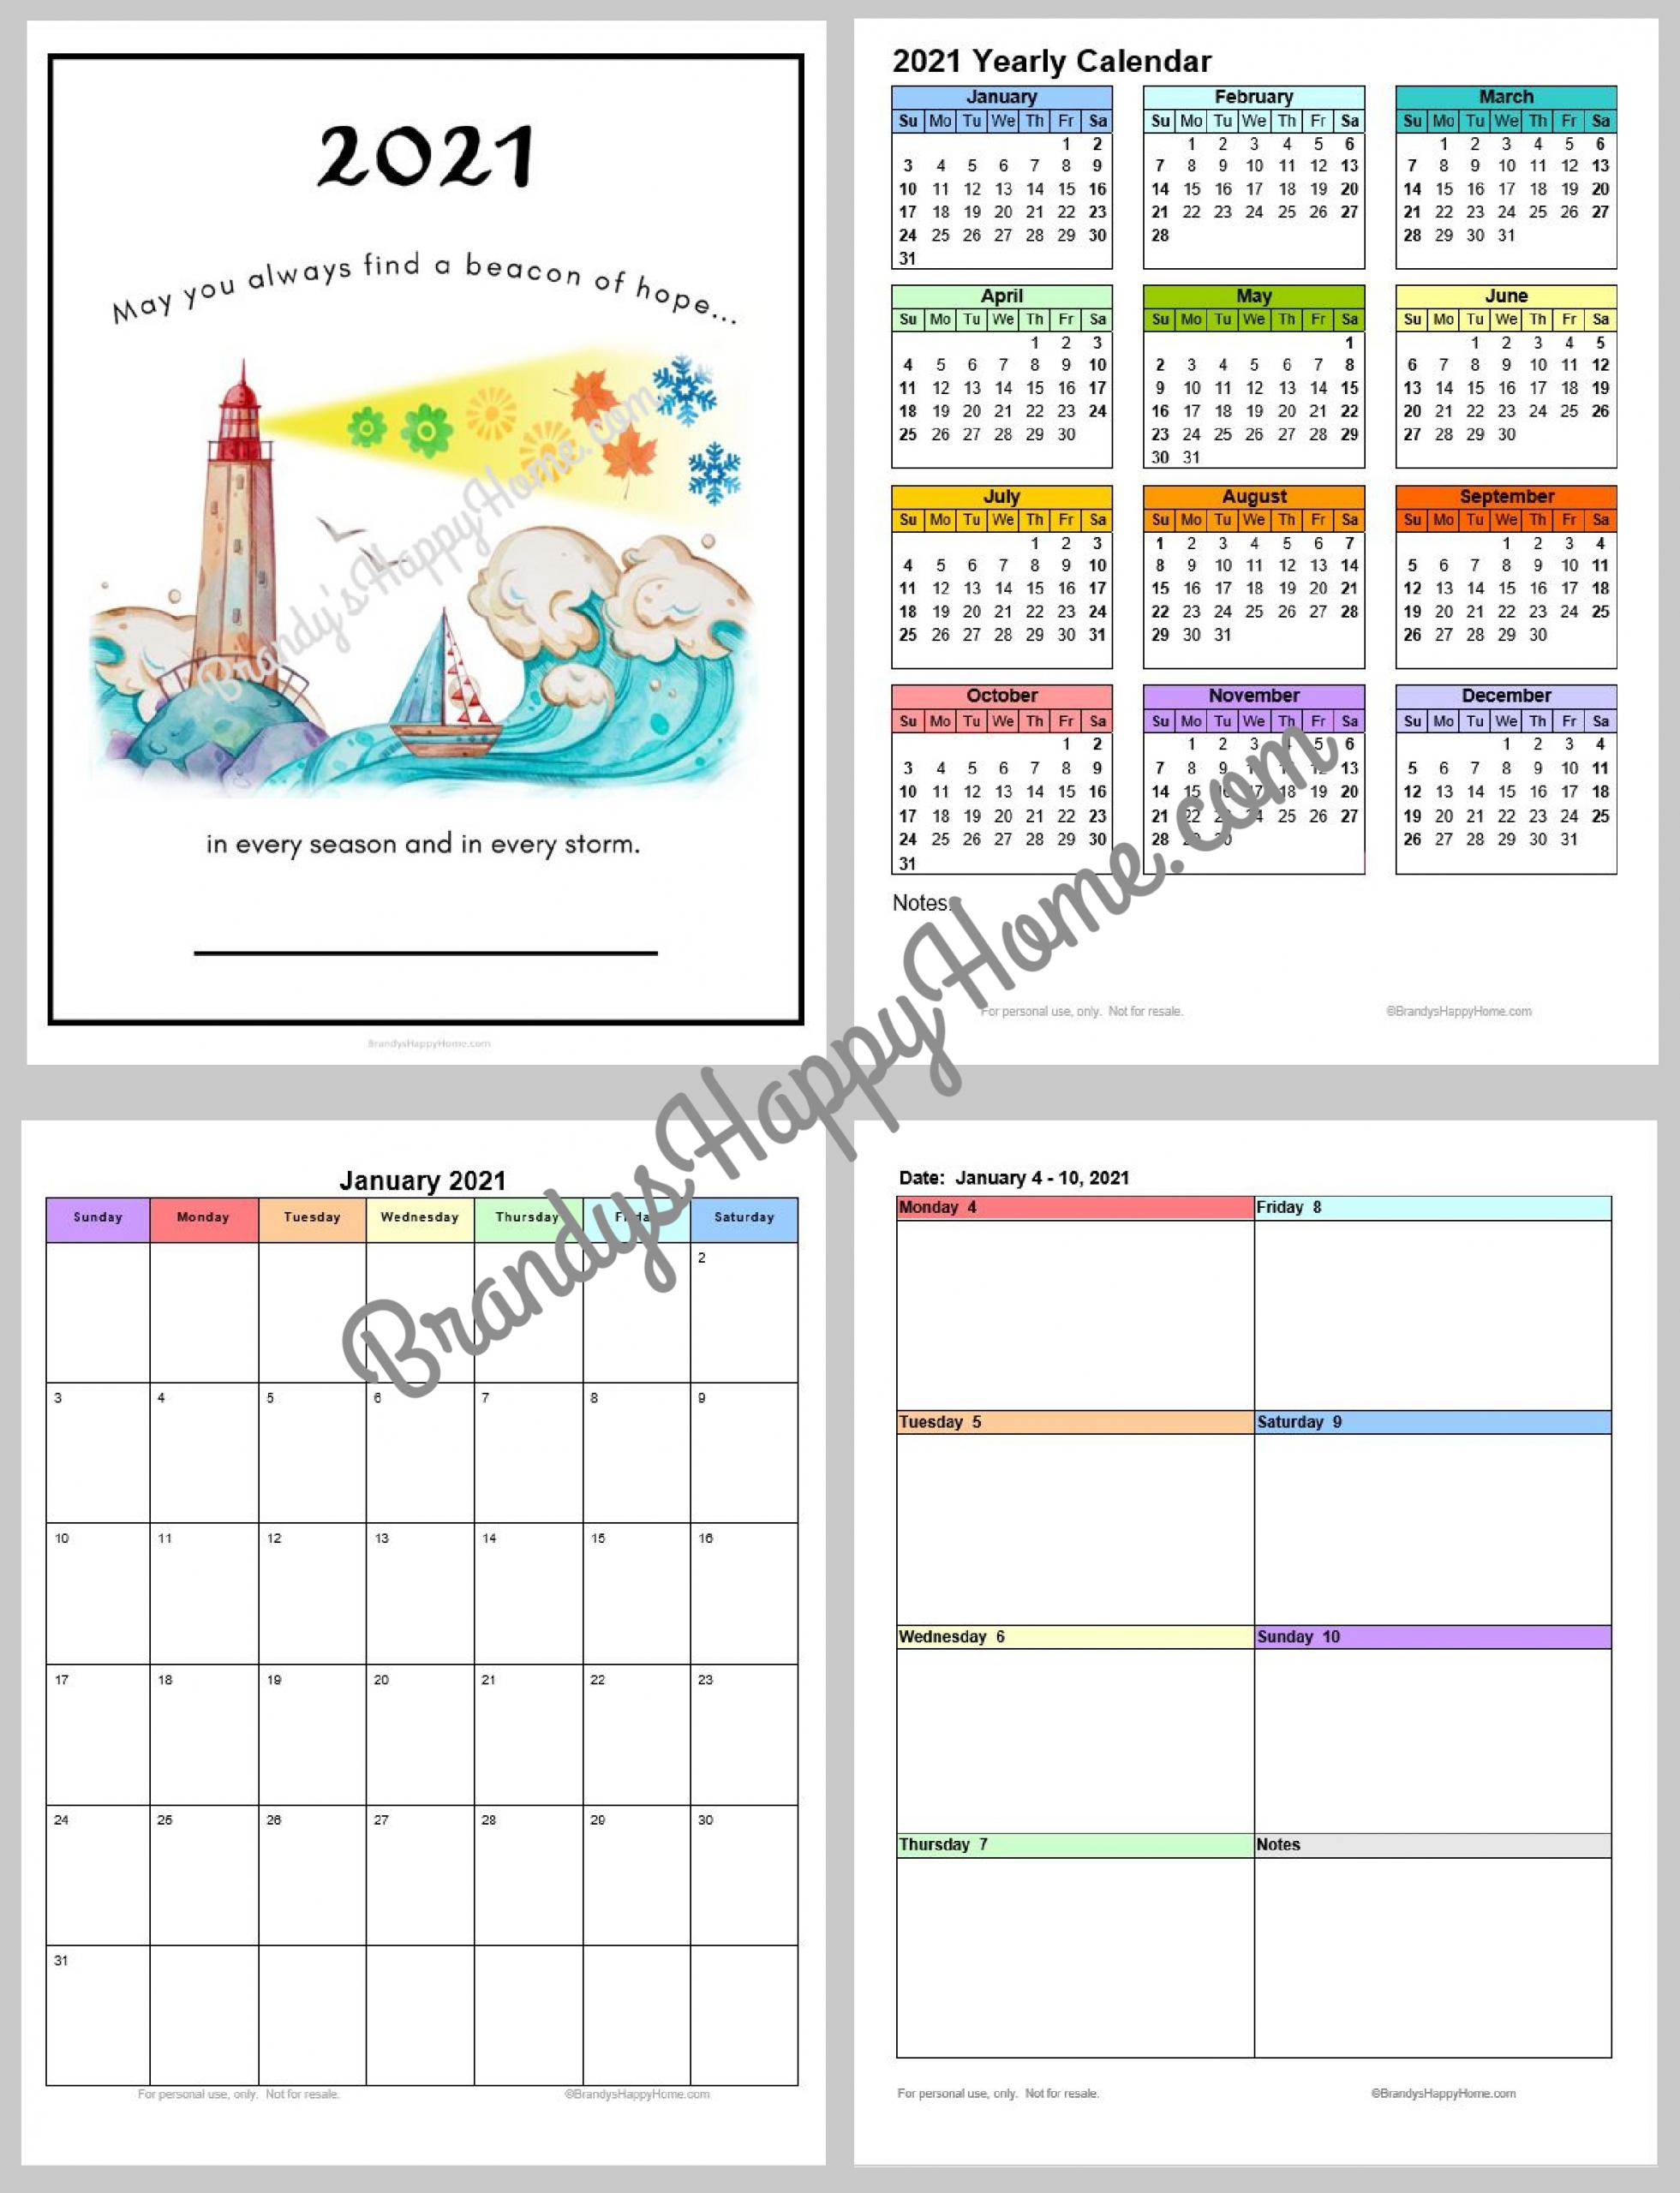 Free 2021 Calendar Planner Printables-4X6 Free Printables 2021 Calendars